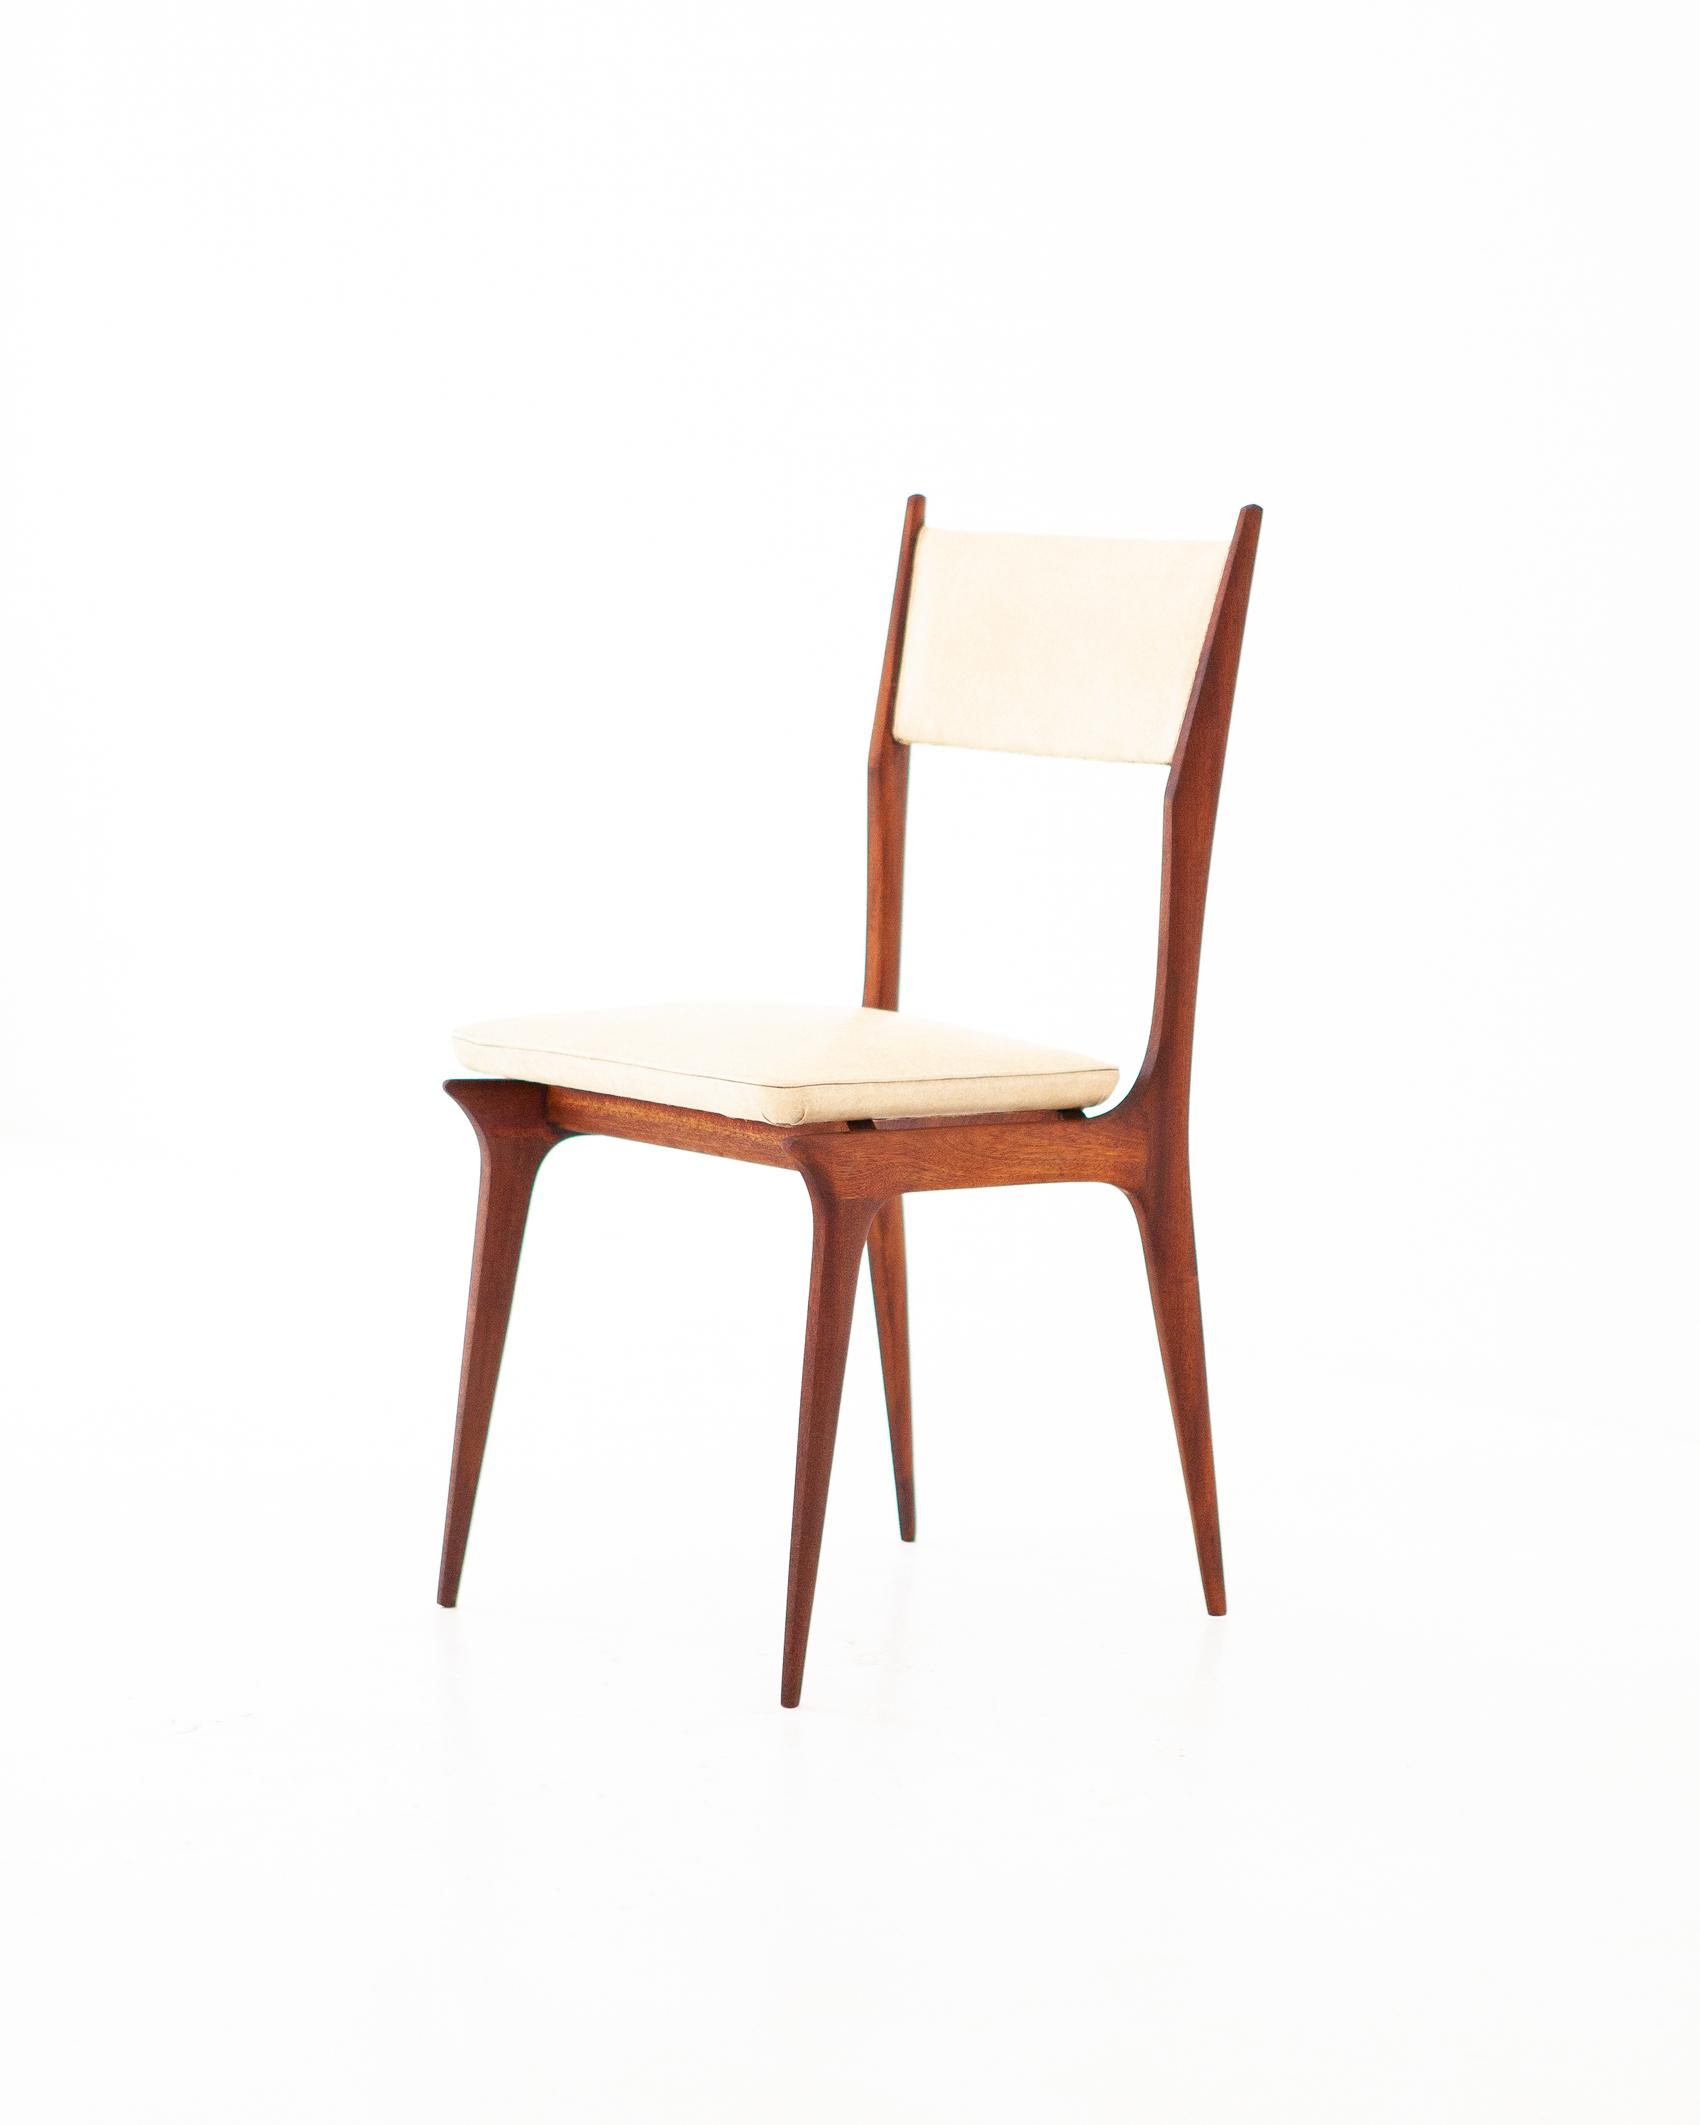 six-italian-mahogany-beige-skai-dining-chairs-1-SE281